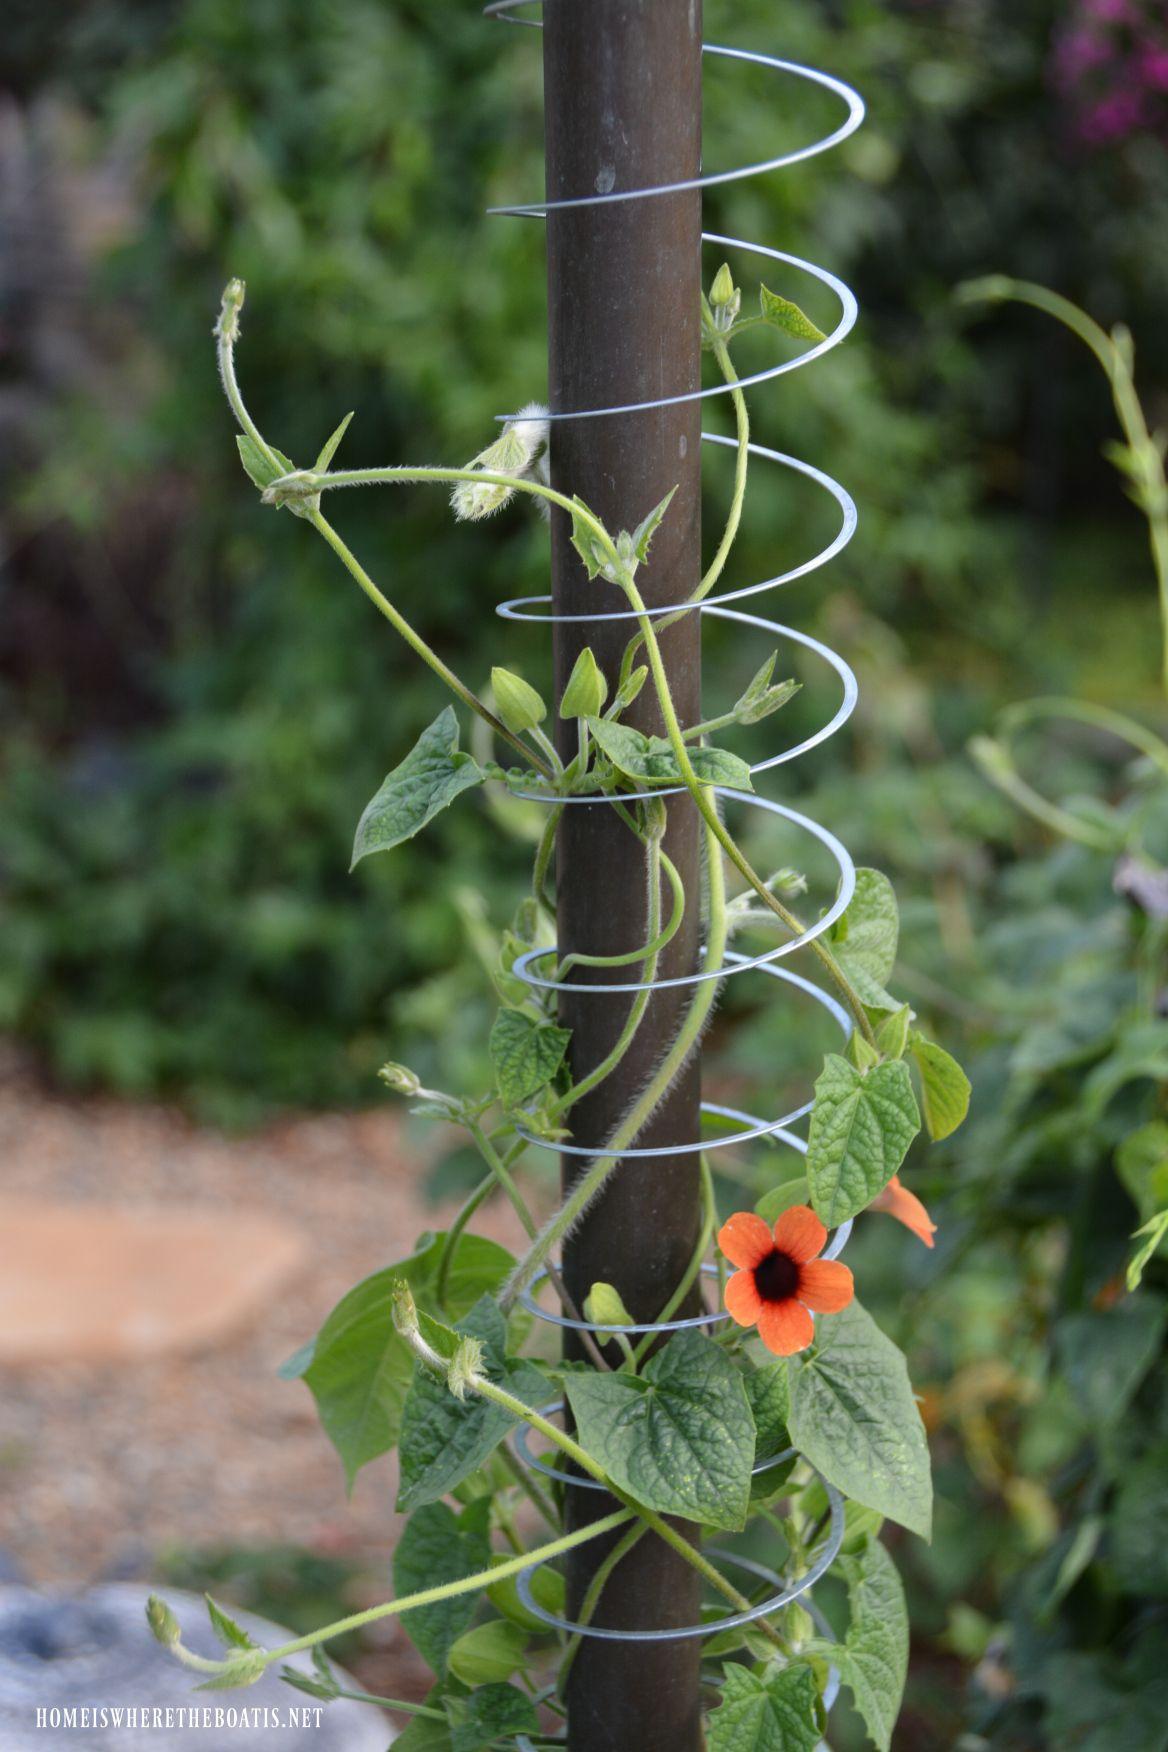 Slinky Hack and Trellis for a Favorite Flowering Vine